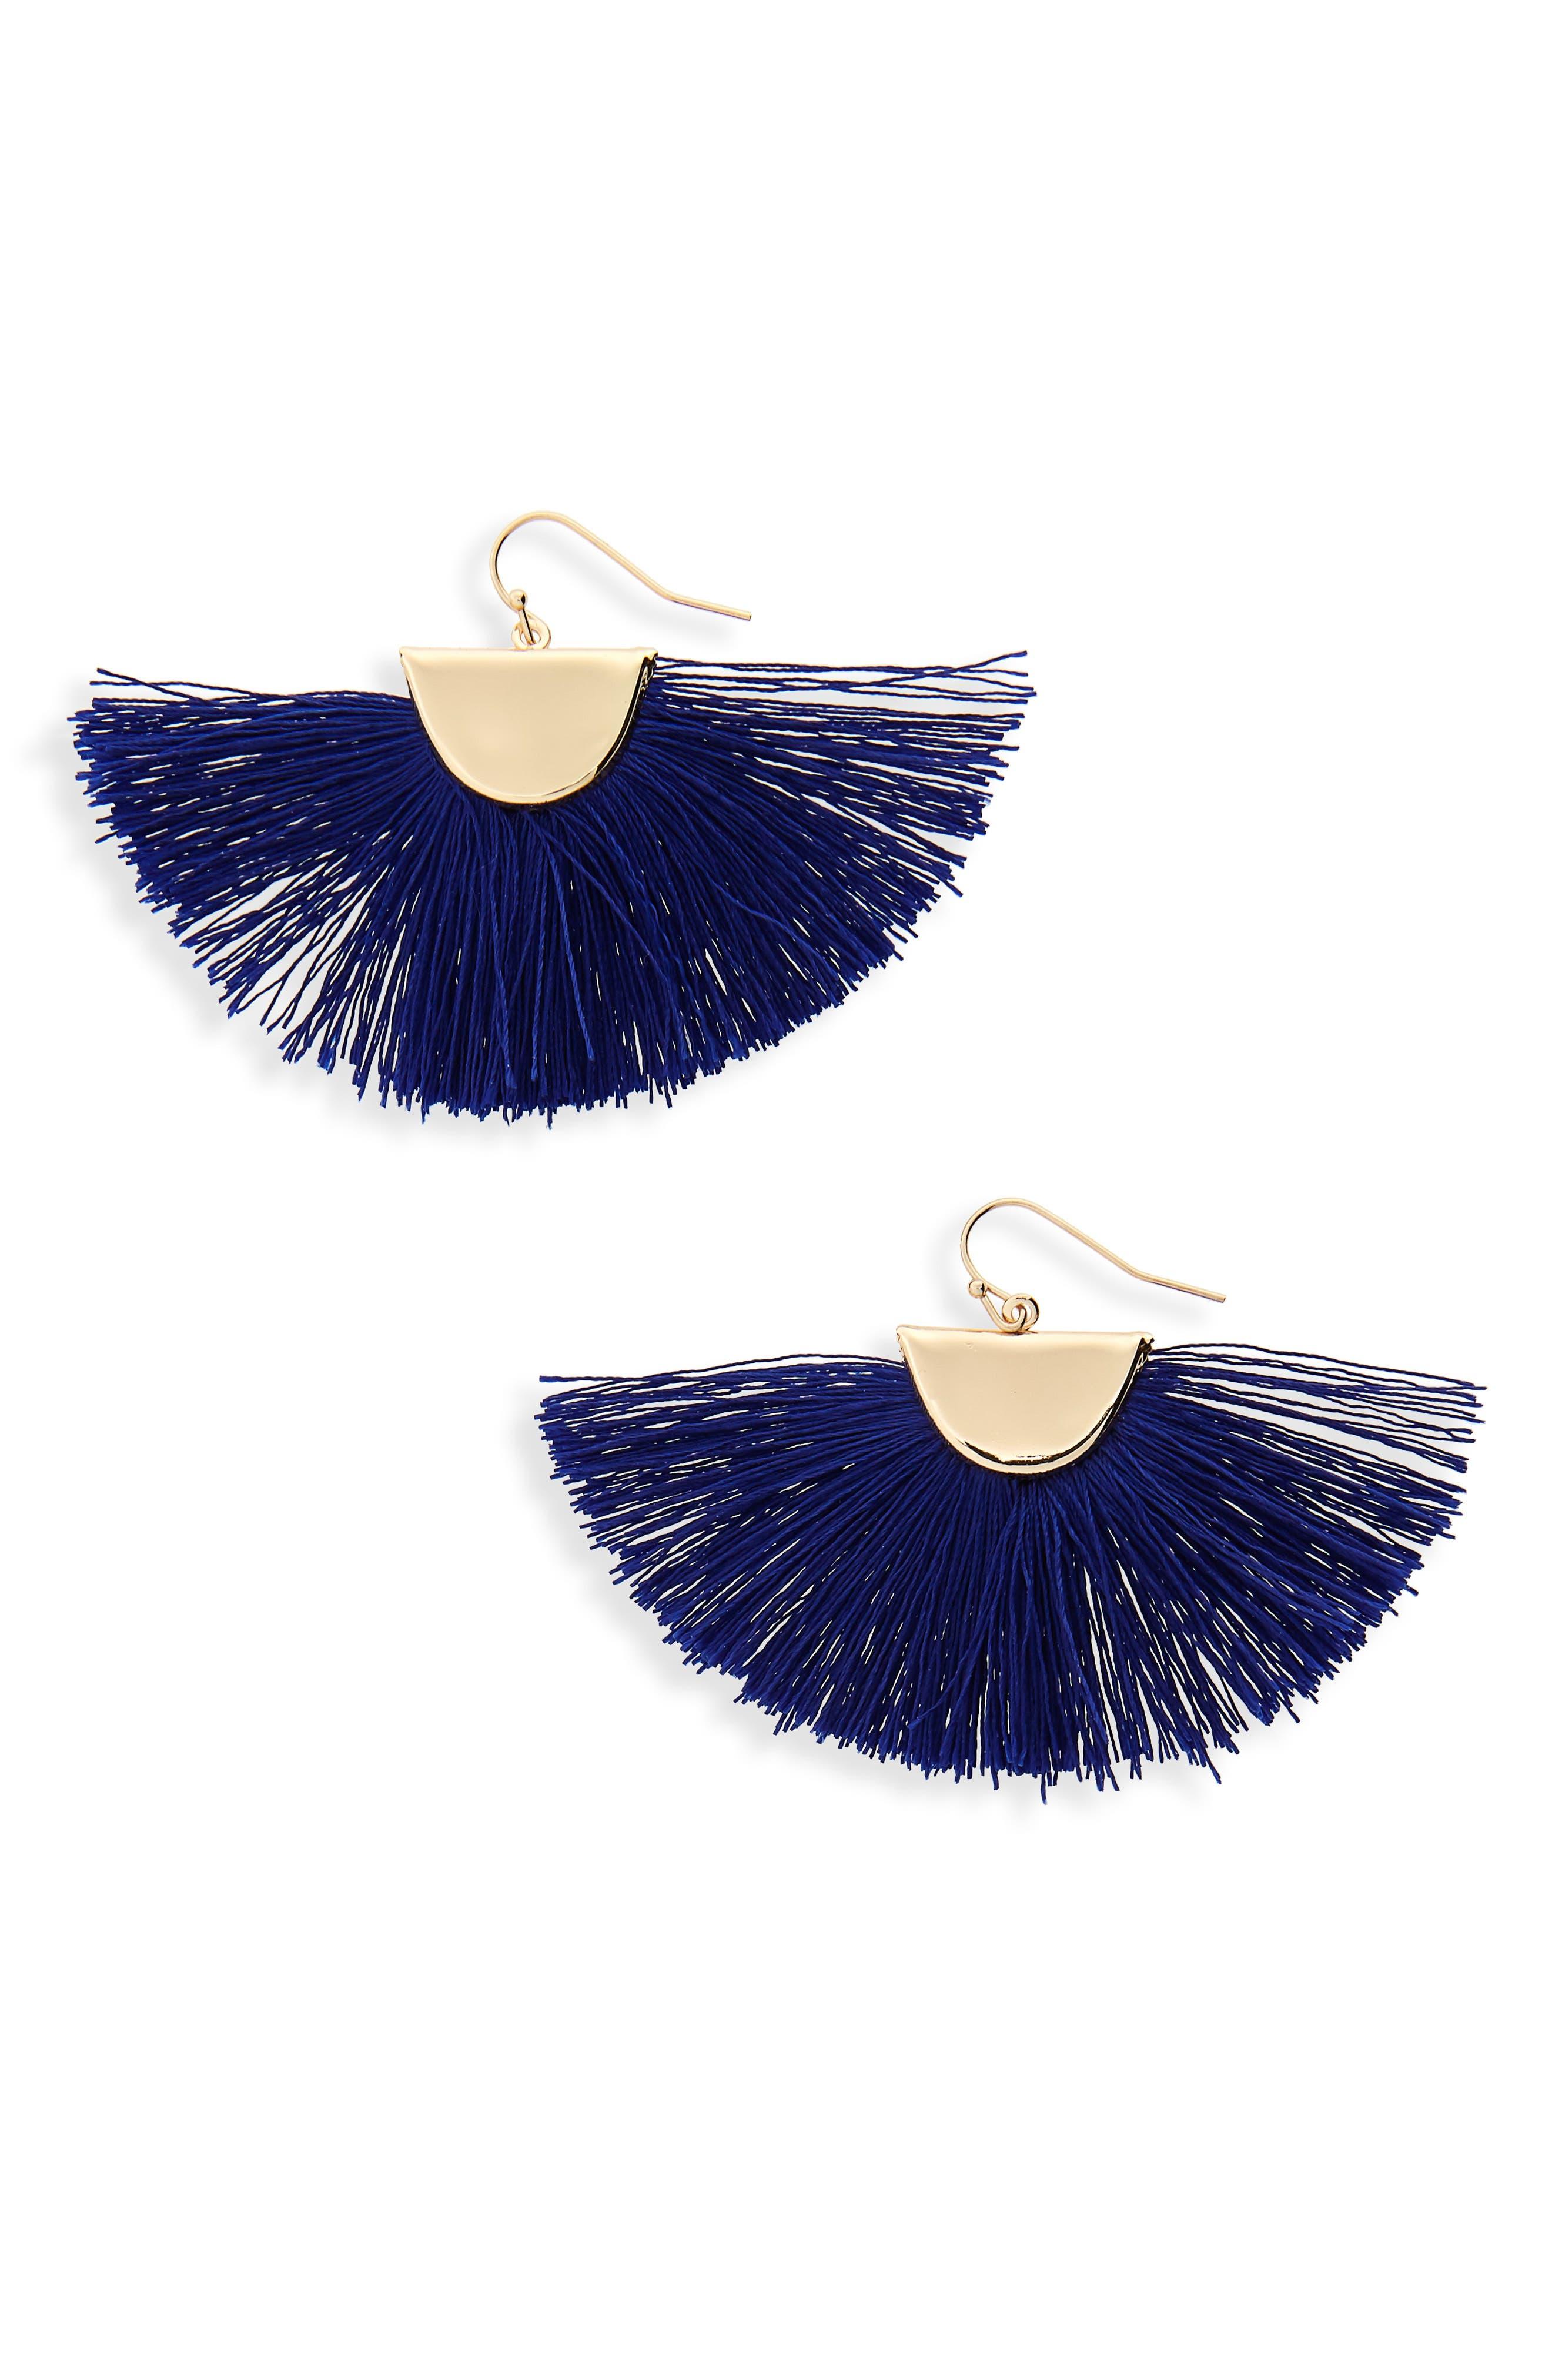 Fan Drop Earrings,                             Main thumbnail 1, color,                             400